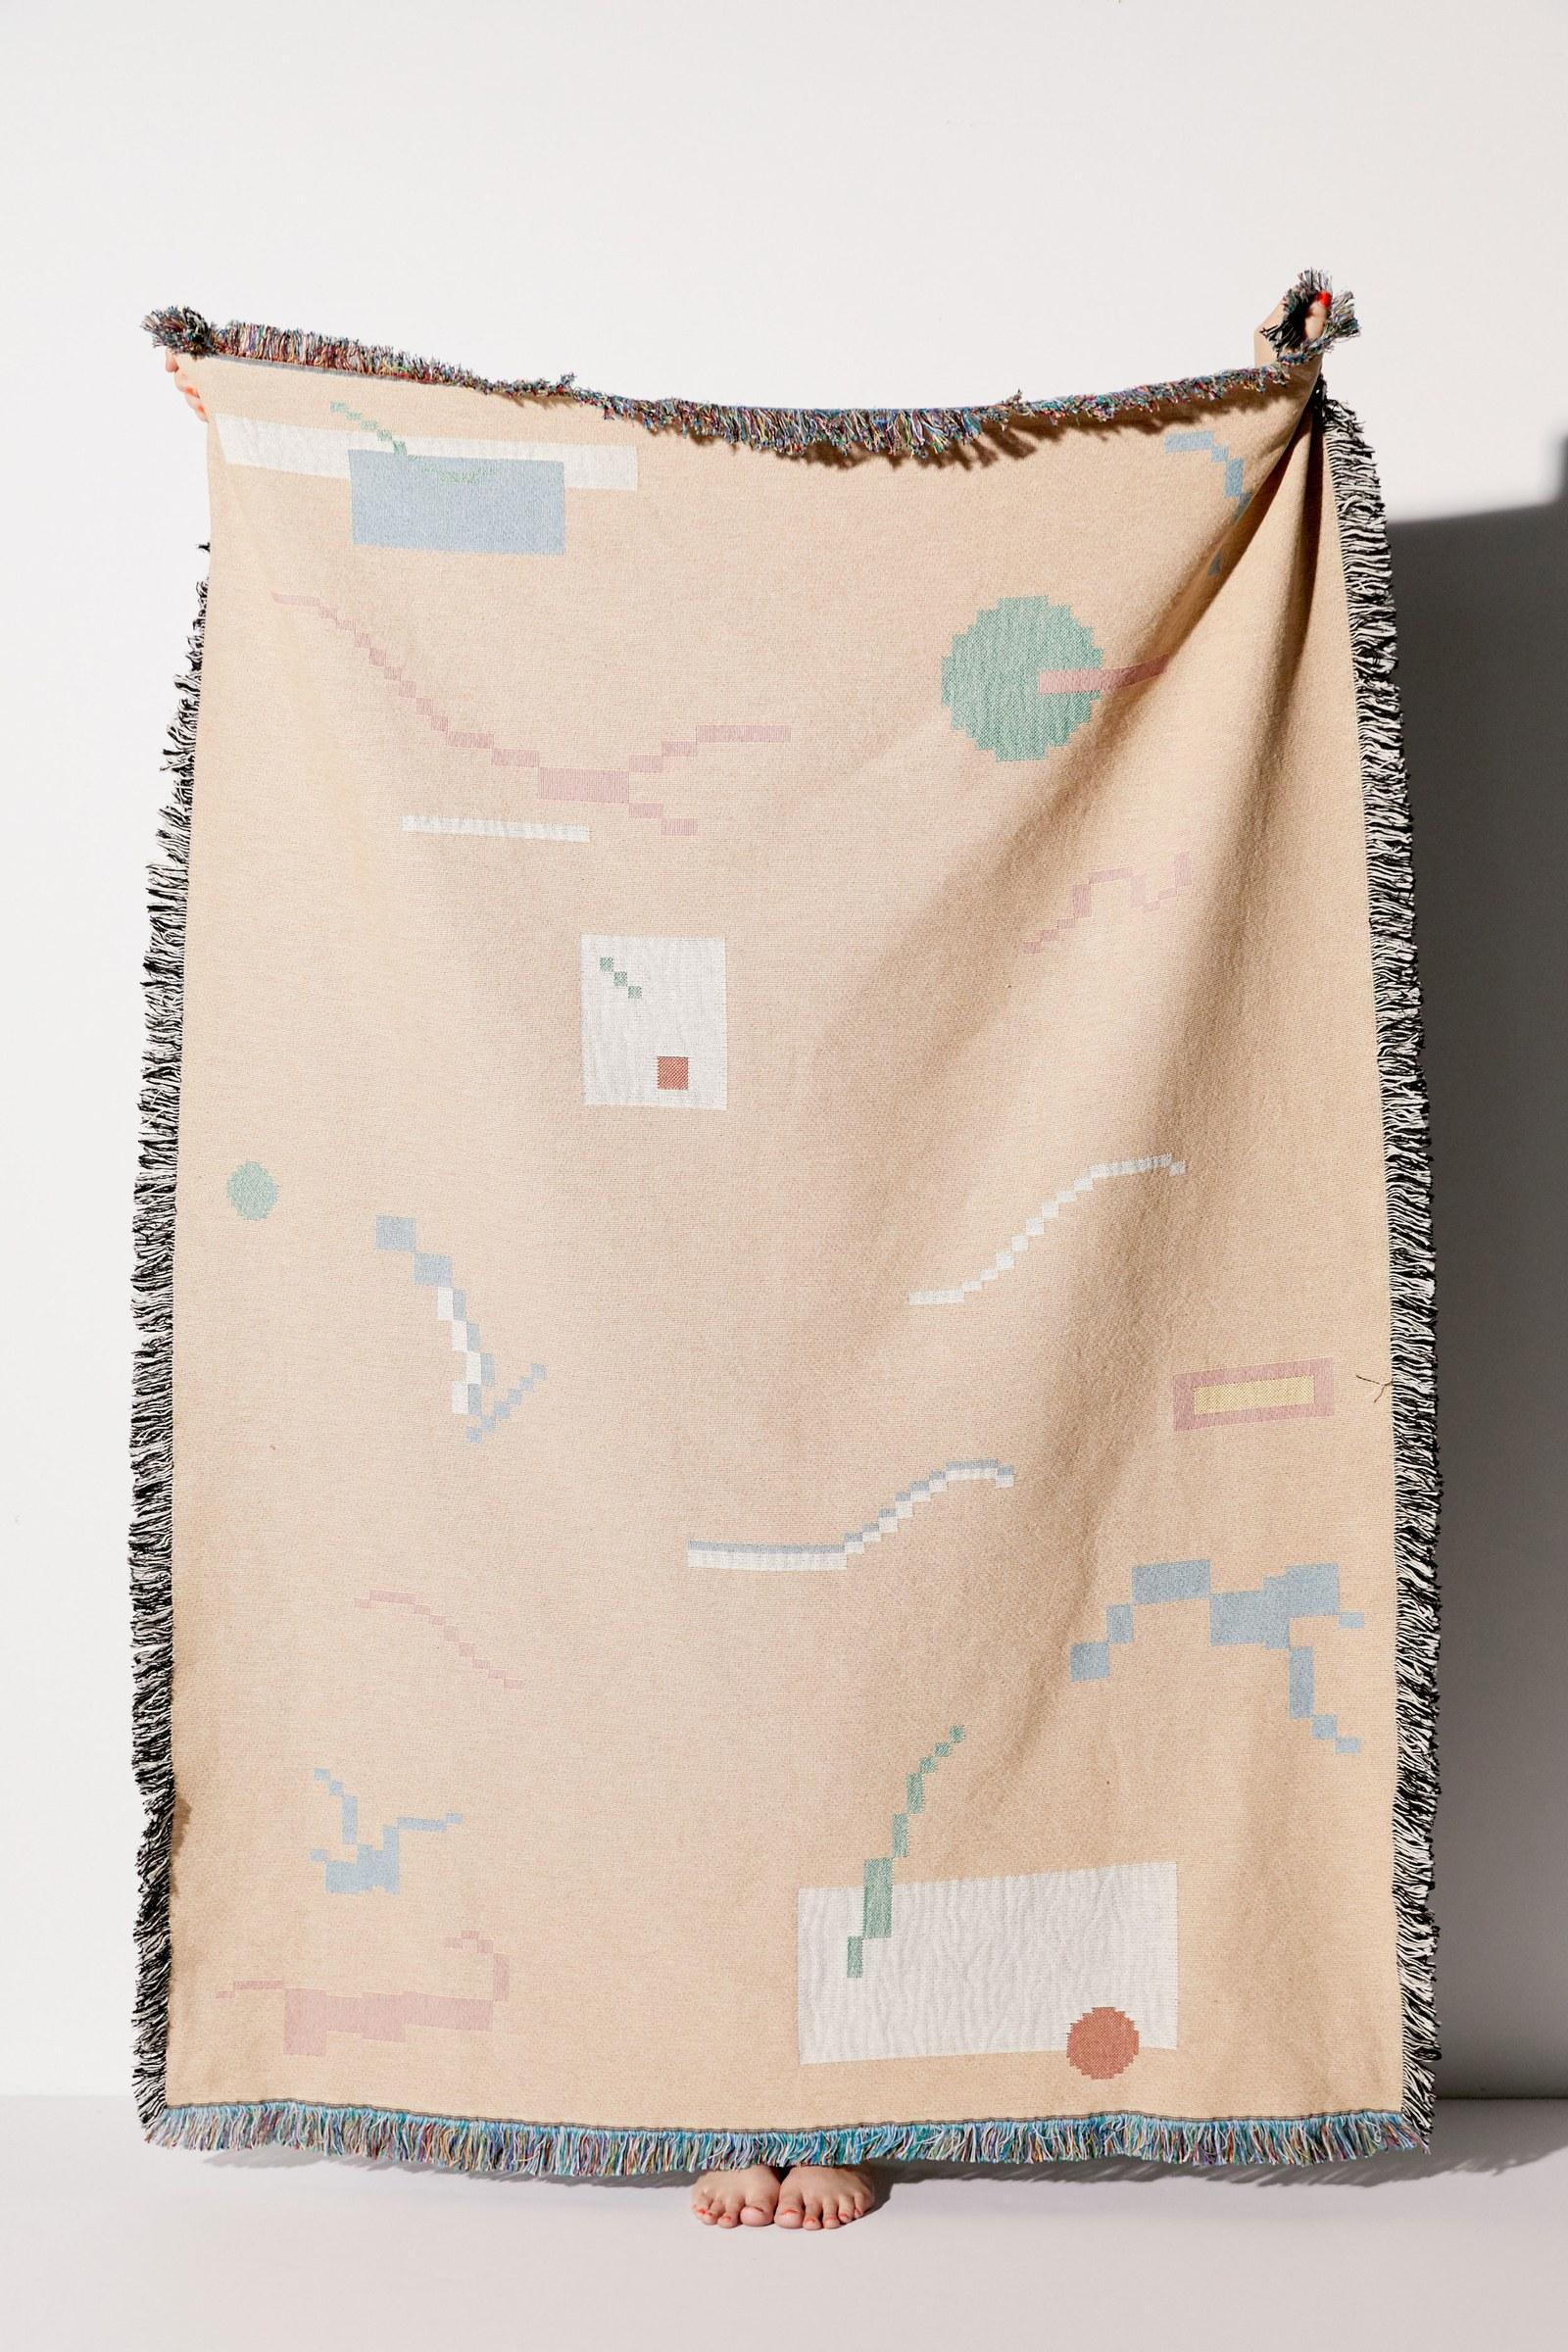 UO x Clever, American textile designer Katherine Entis